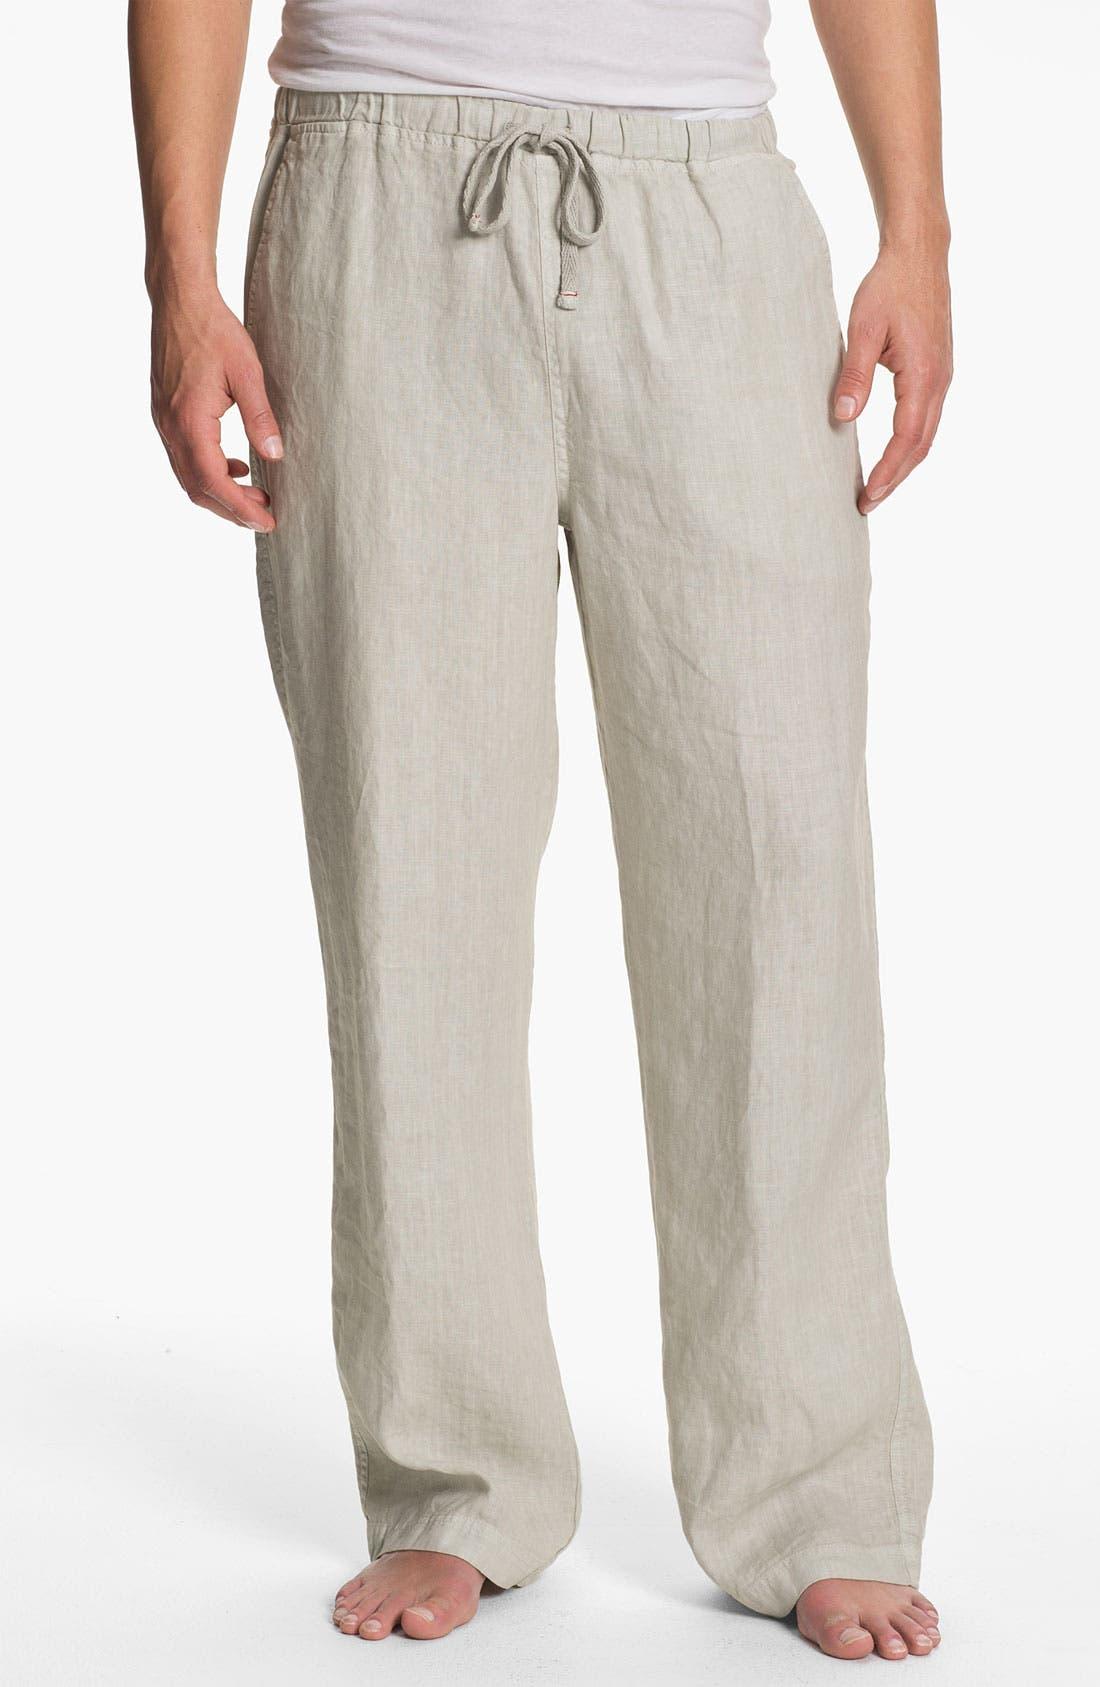 Alternate Image 1 Selected - Daniel Buchler Linen Pants